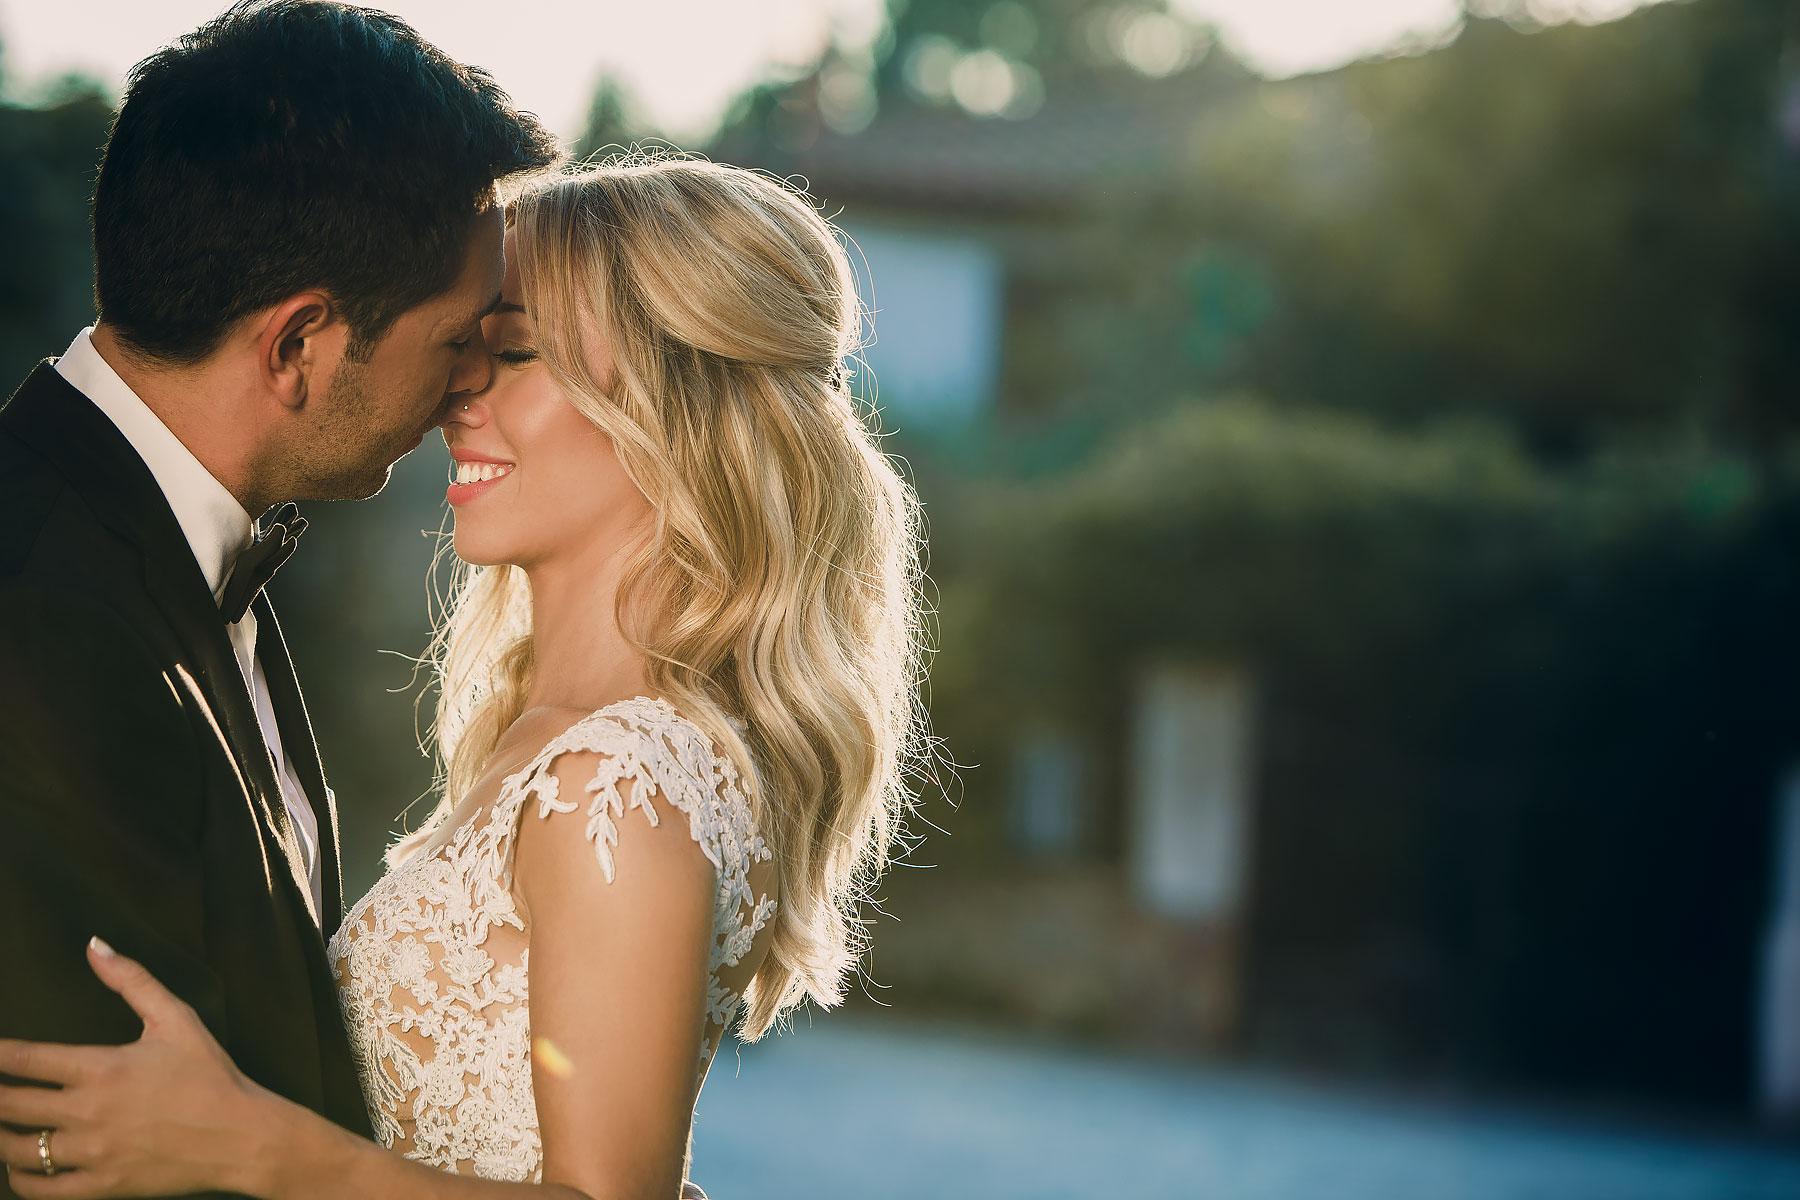 cd4cP2Photography_wedding_Greece_Nikos_Afroditi_2244.jpg